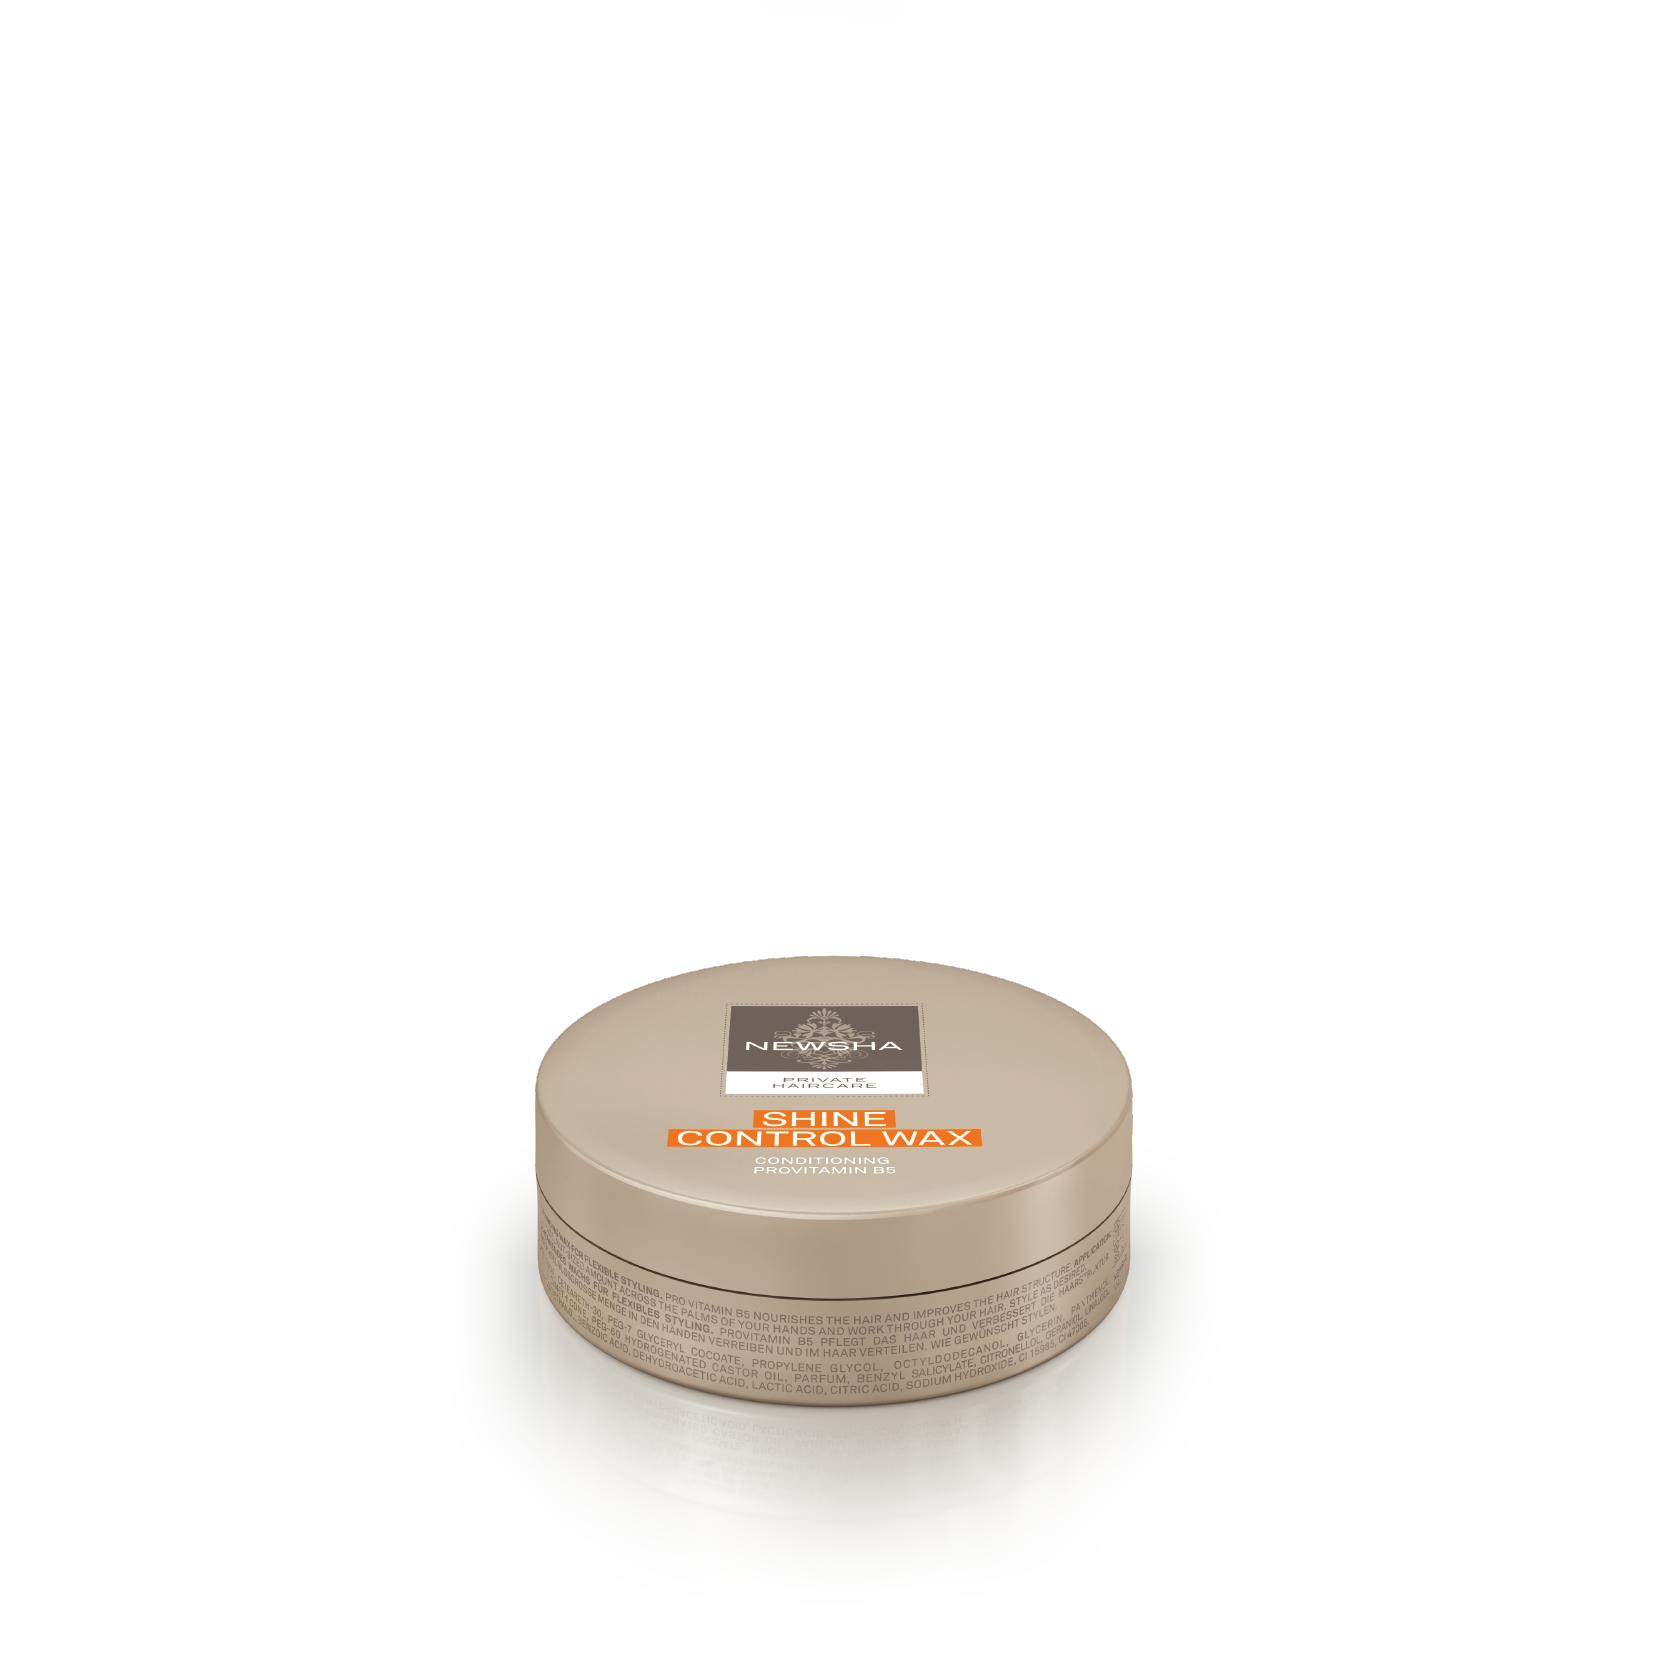 Newsha Product Shots-Shine Control Wax.png